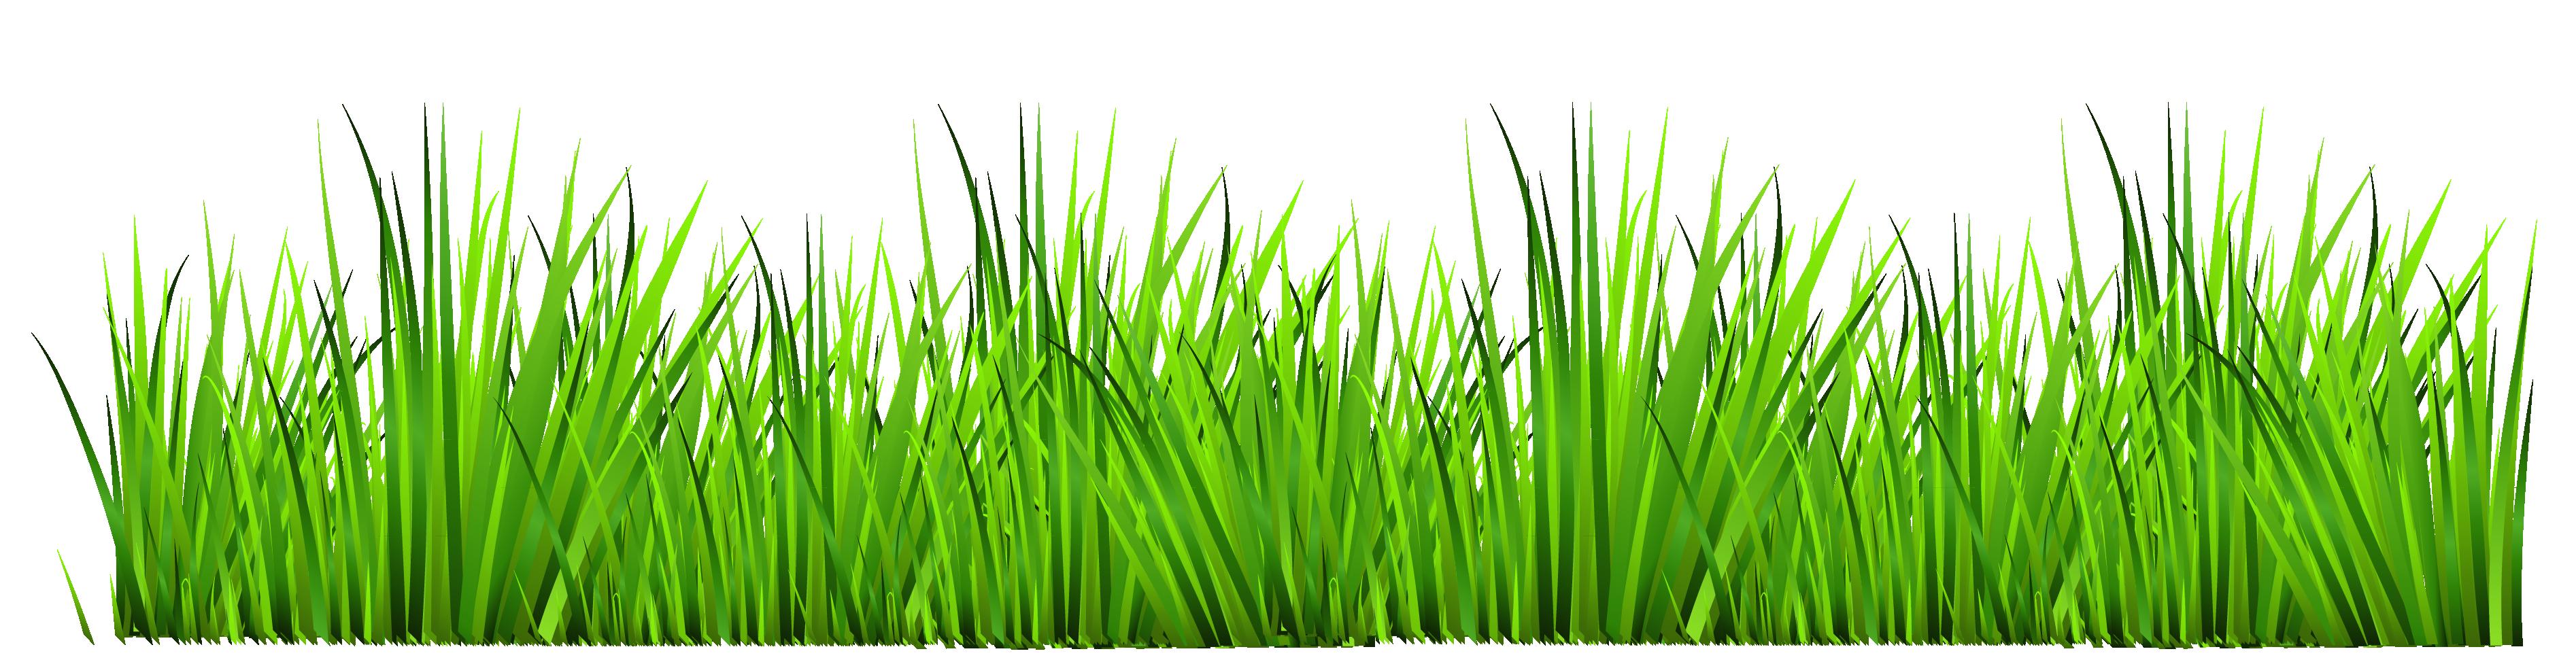 Grass clip art free clipart images